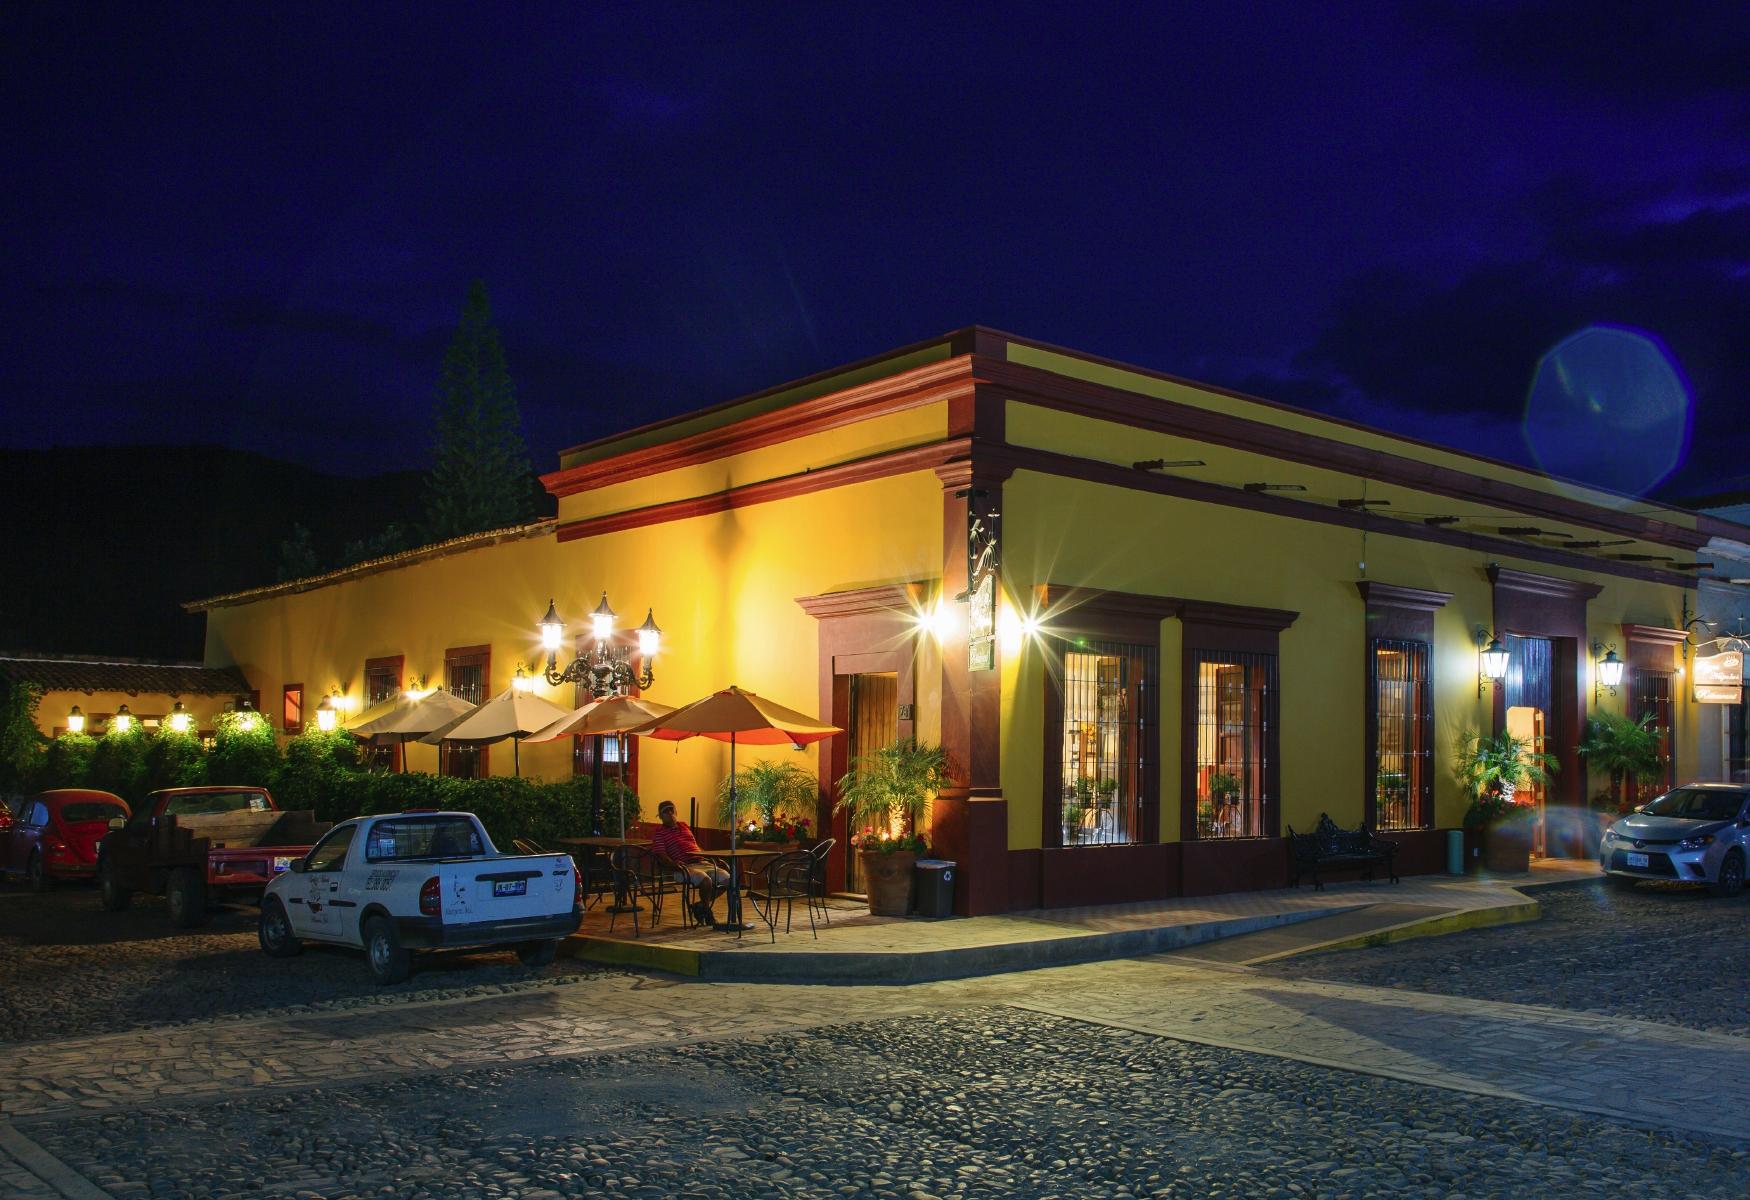 Jalisco # Muebles Napoles Guadalajara